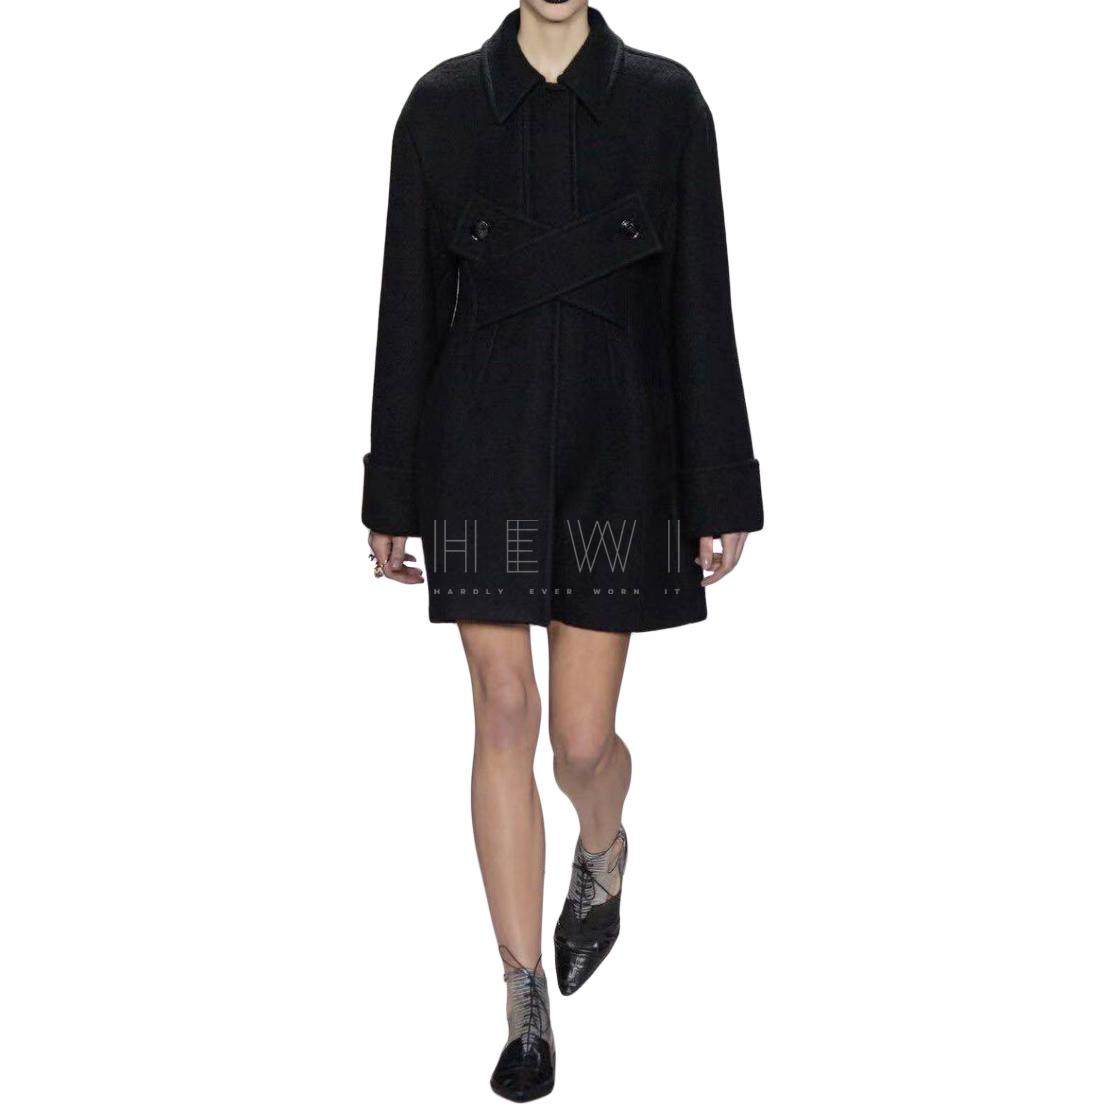 Dior Runway Black Wool Blend Coat